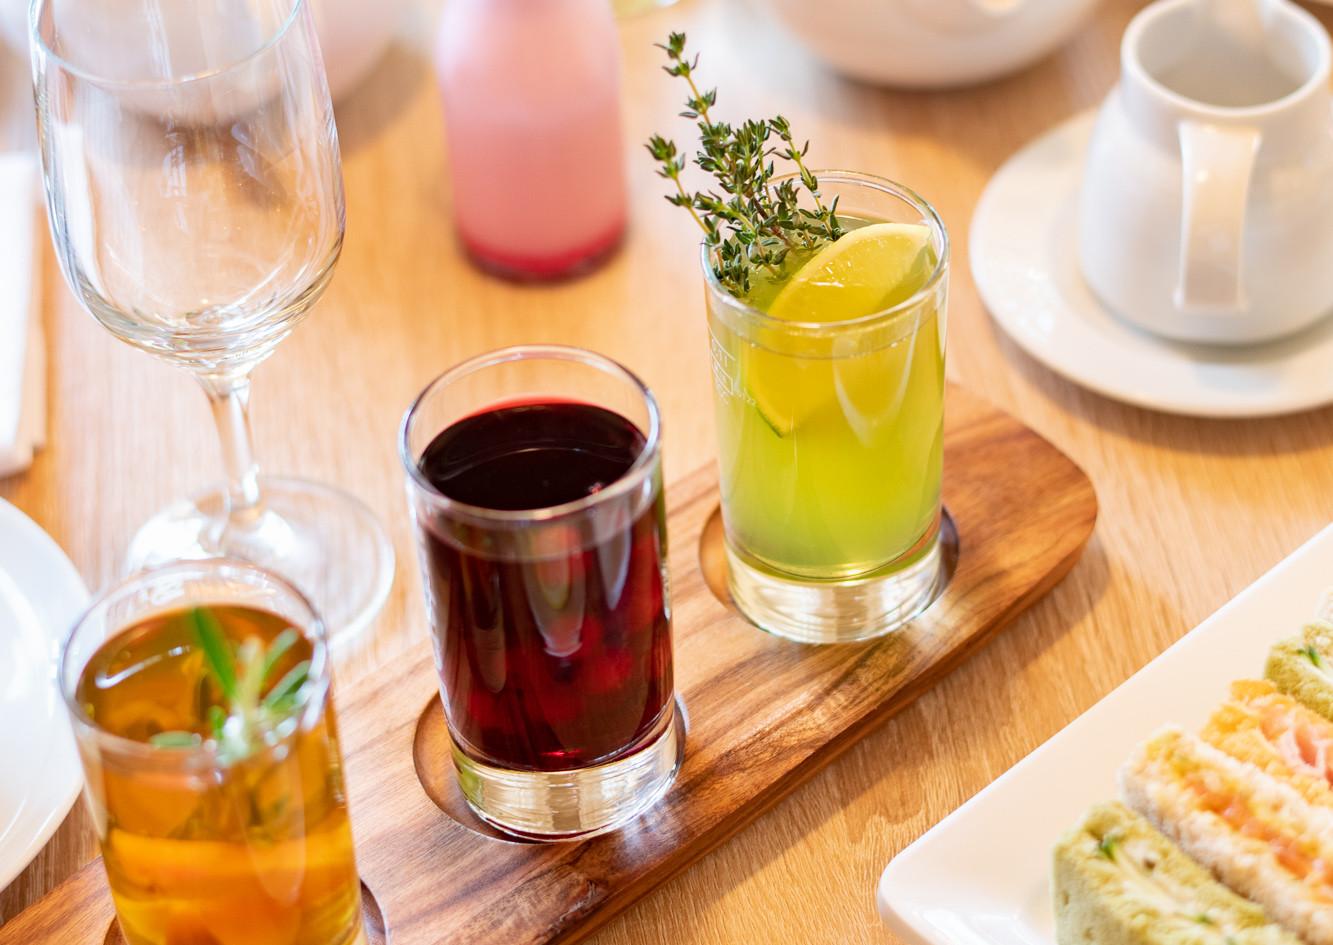 Eistee Afternoon Tea - Hotel Wegner - The culinary Art Hotel